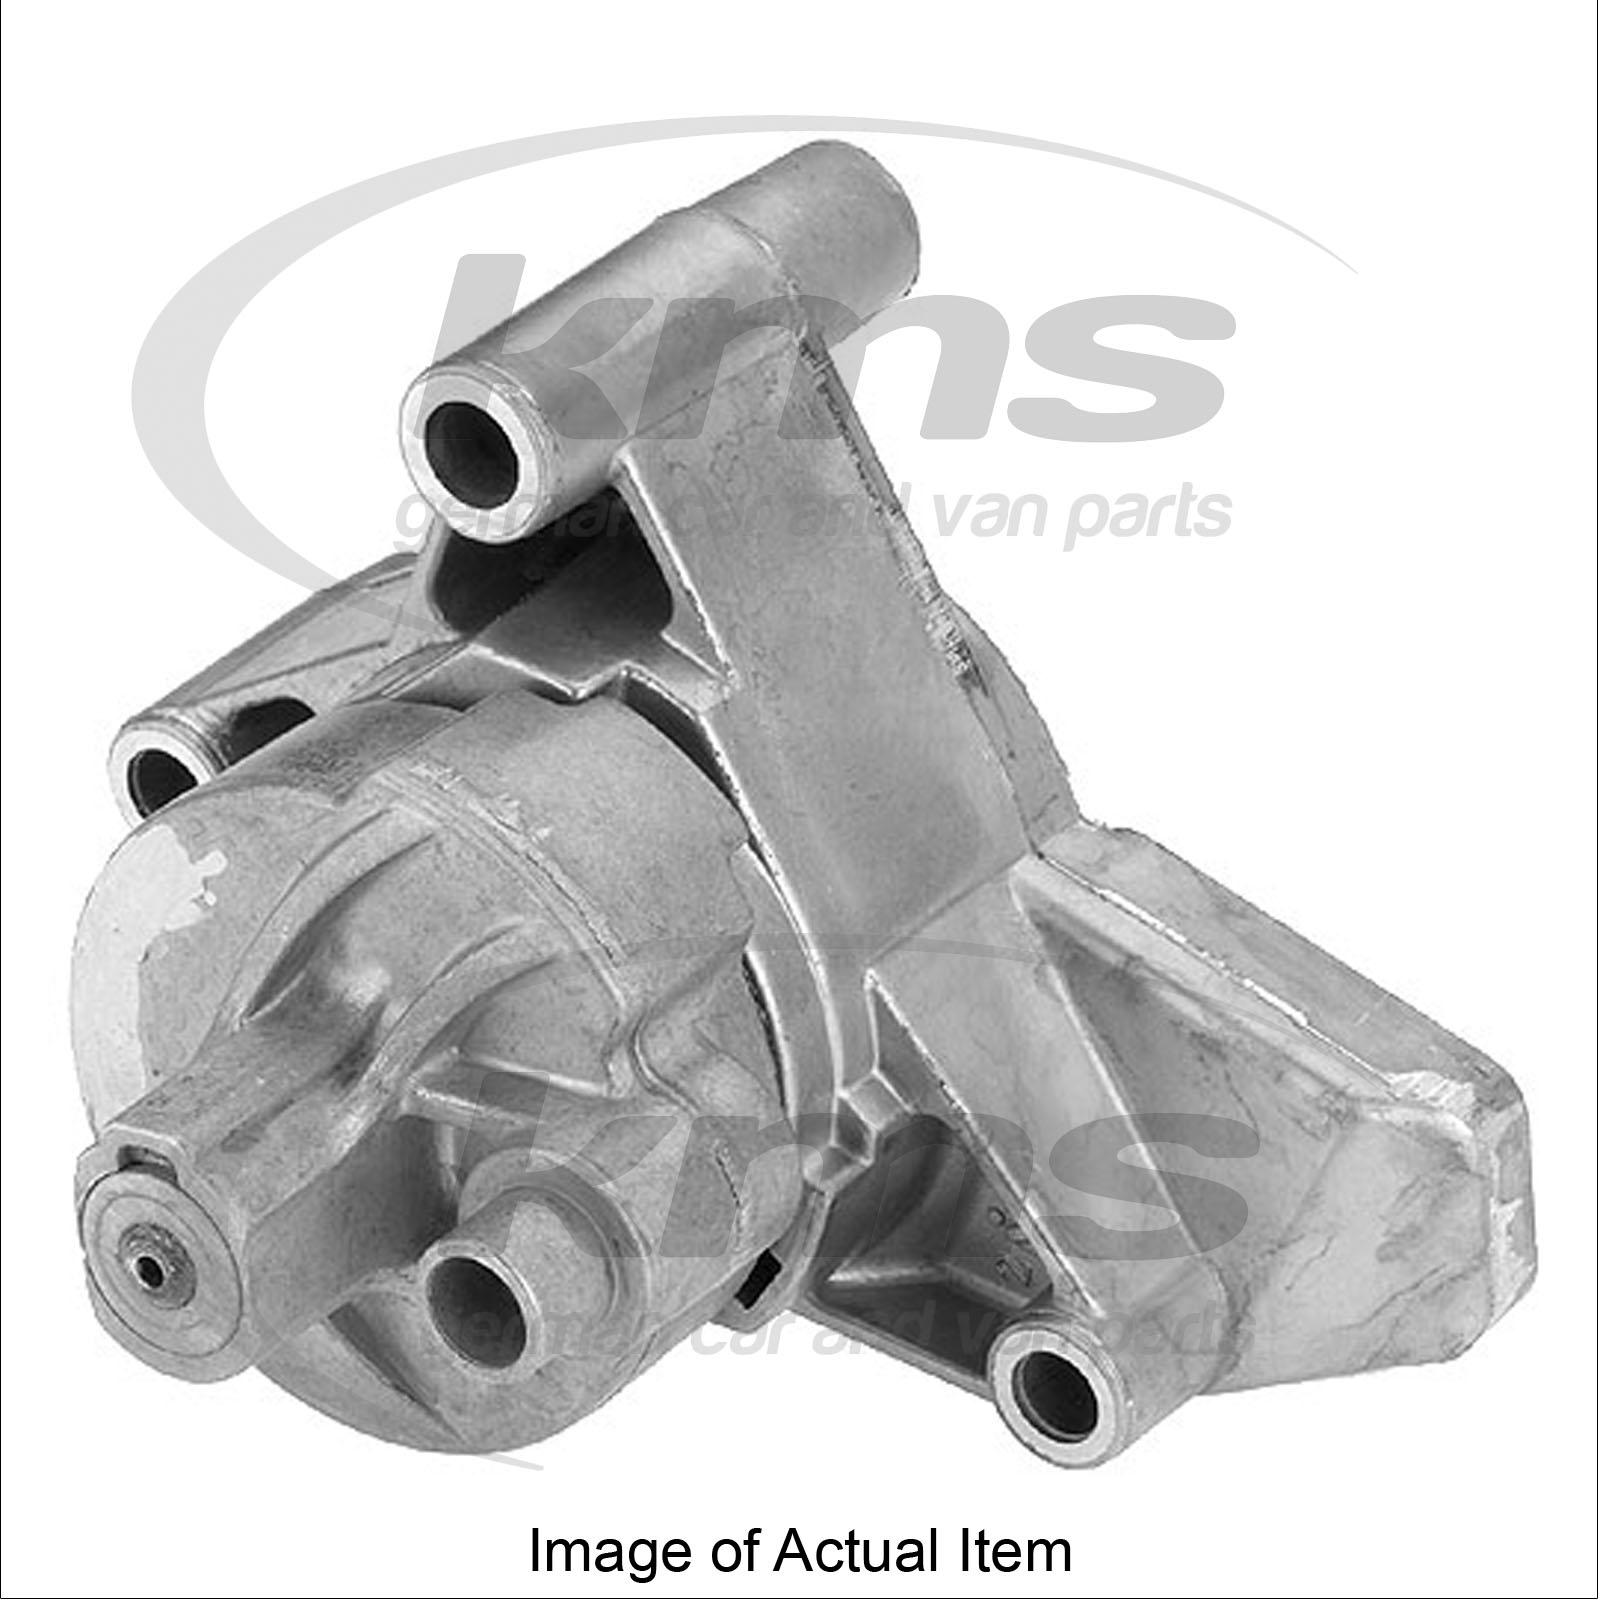 2011 mercedes benz sl class water pump belt replacement for Poly v belt for mercedes benz